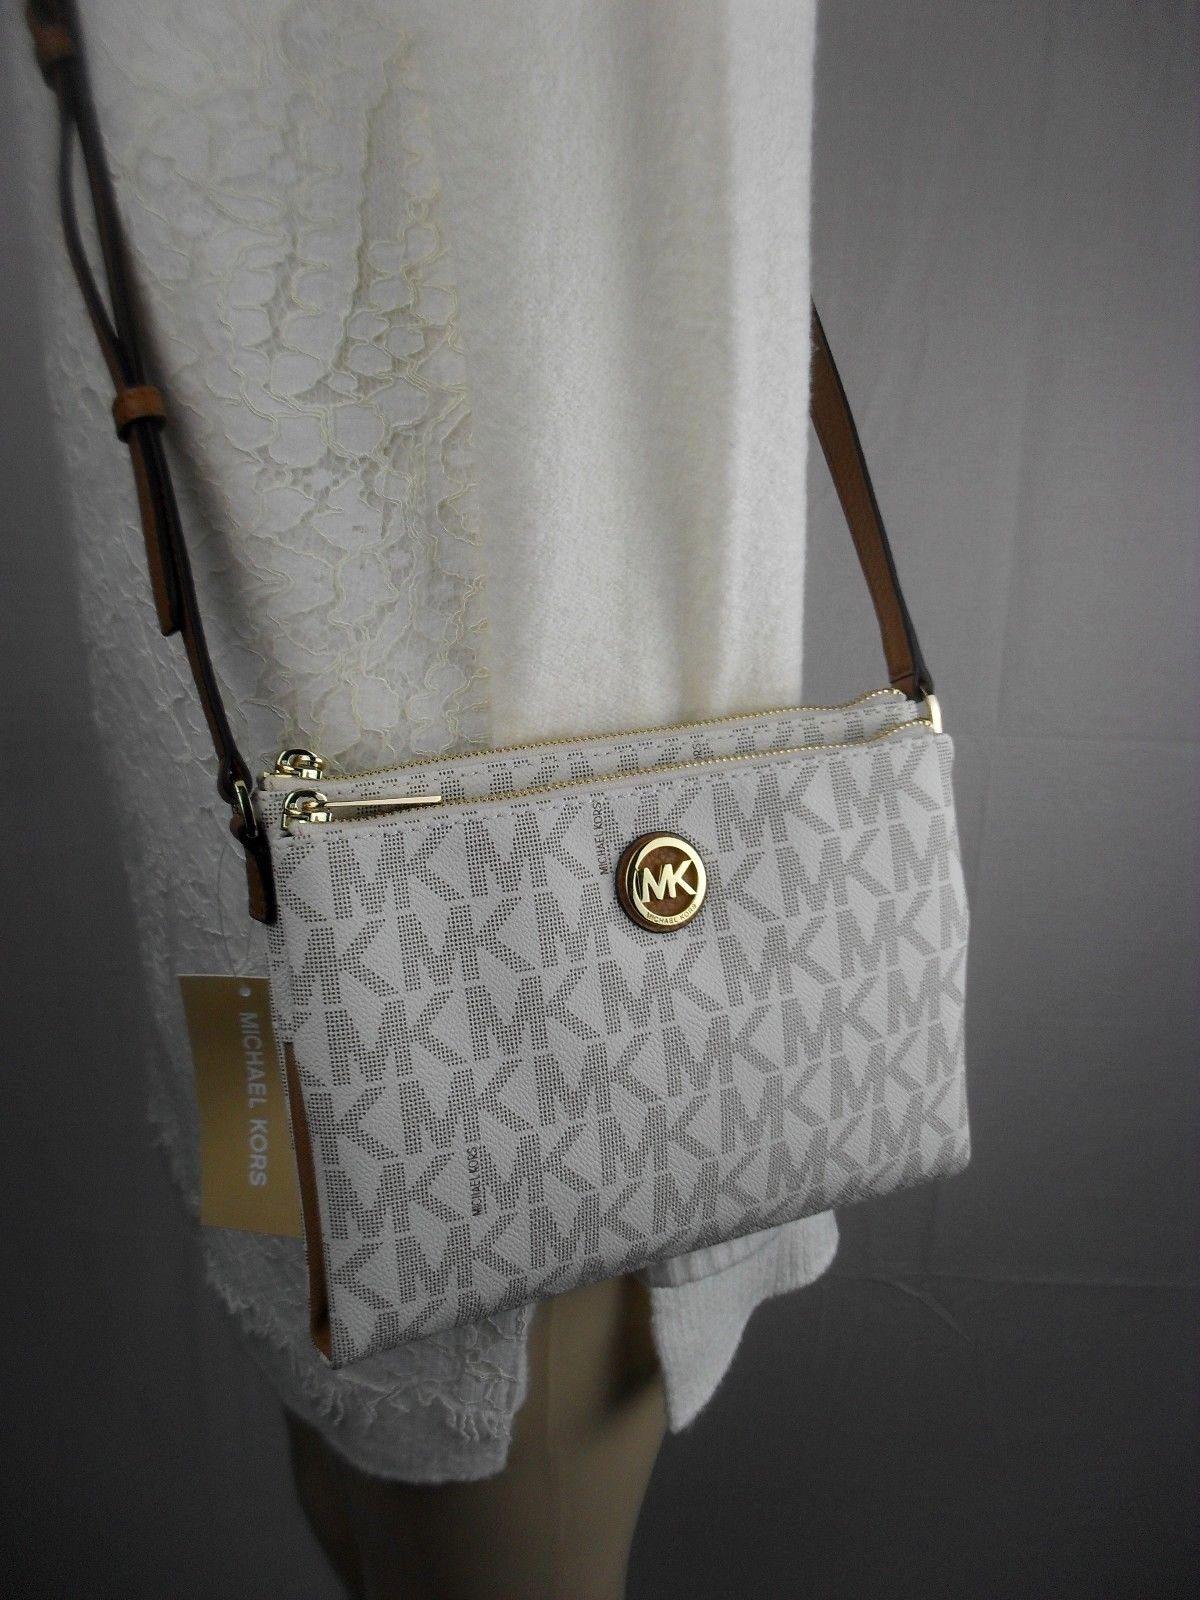 16939a28eb0dda NWT Michael Kors Vanilla Fulton Large EW Crossbody PVC Handbag MK Messenger  Bag